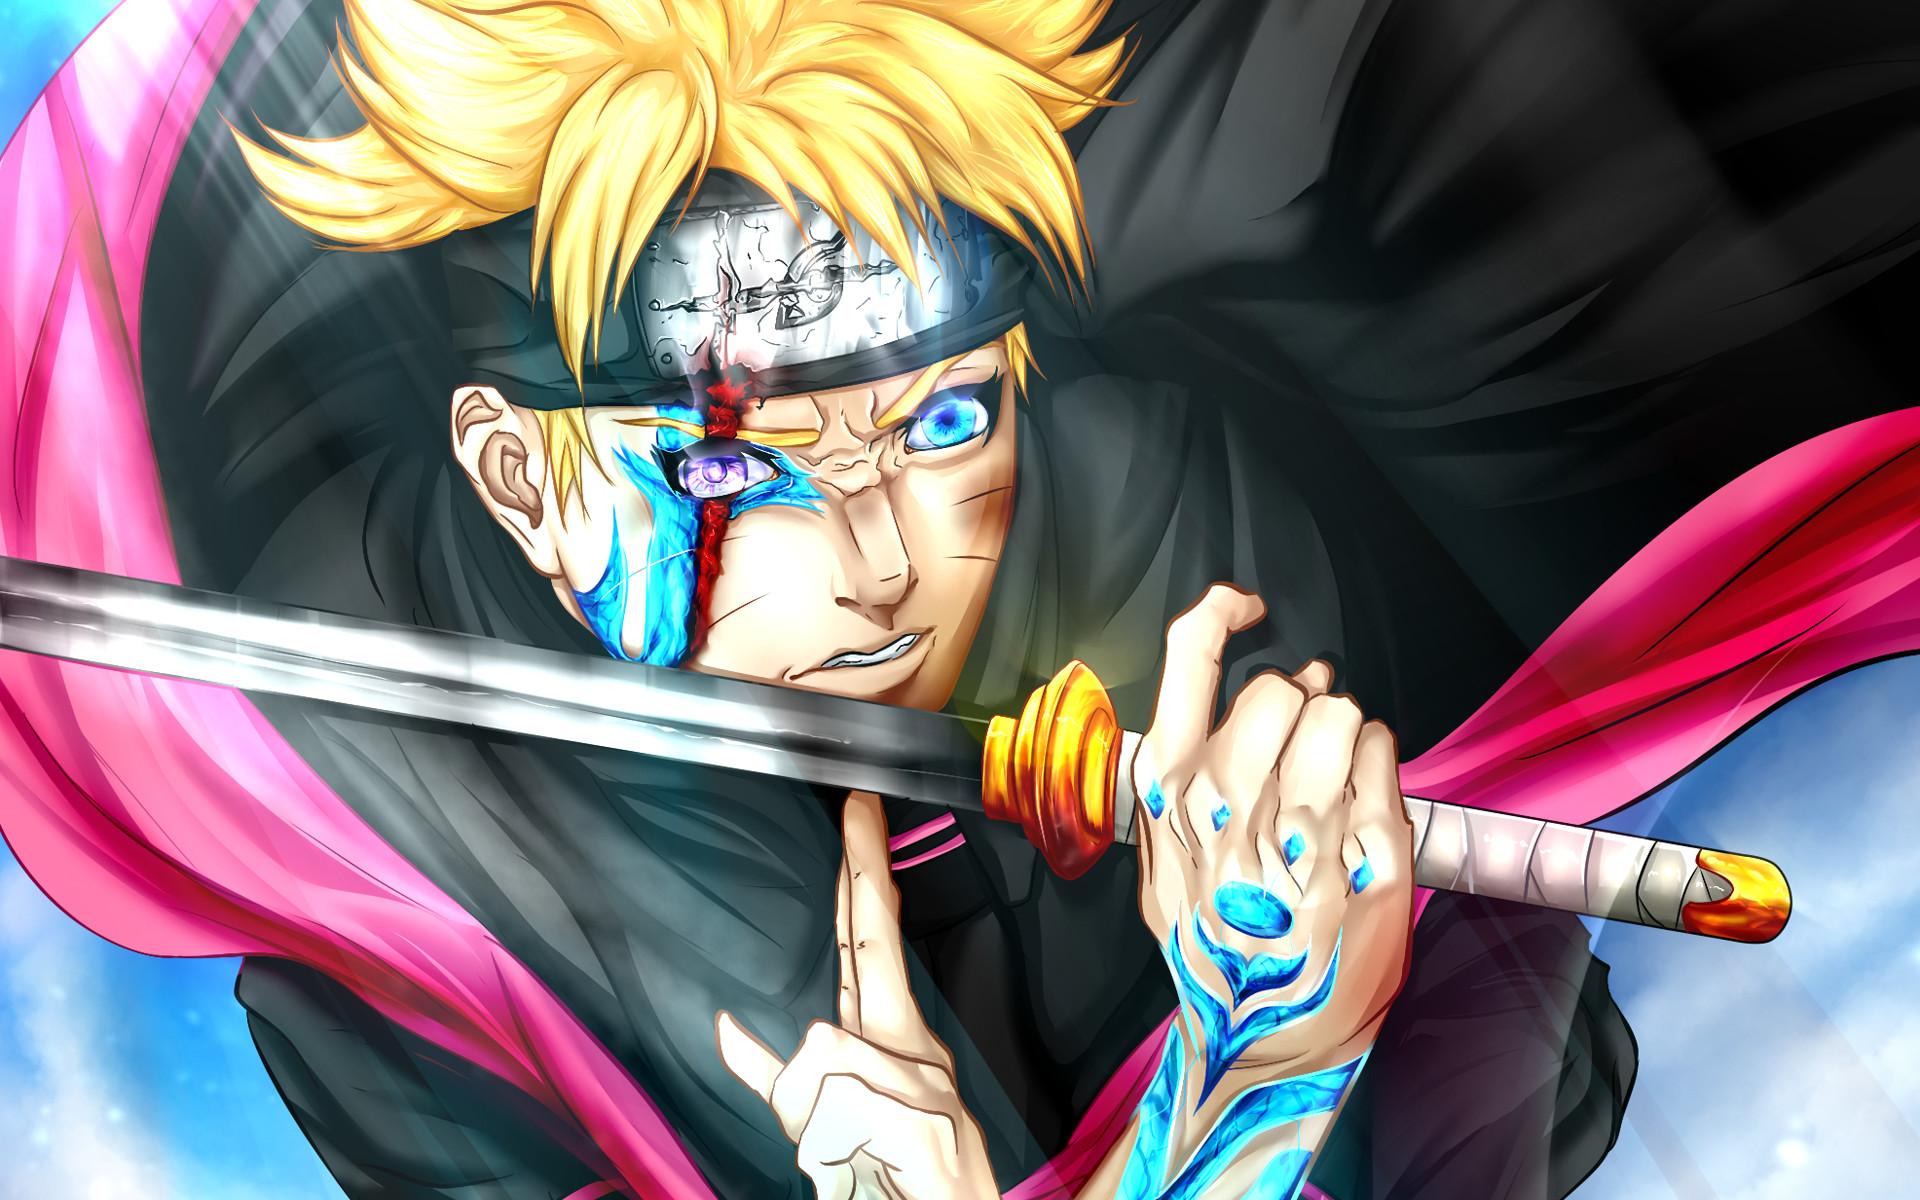 ✓ Terbaik Download Gambar Anime Naruto Keren